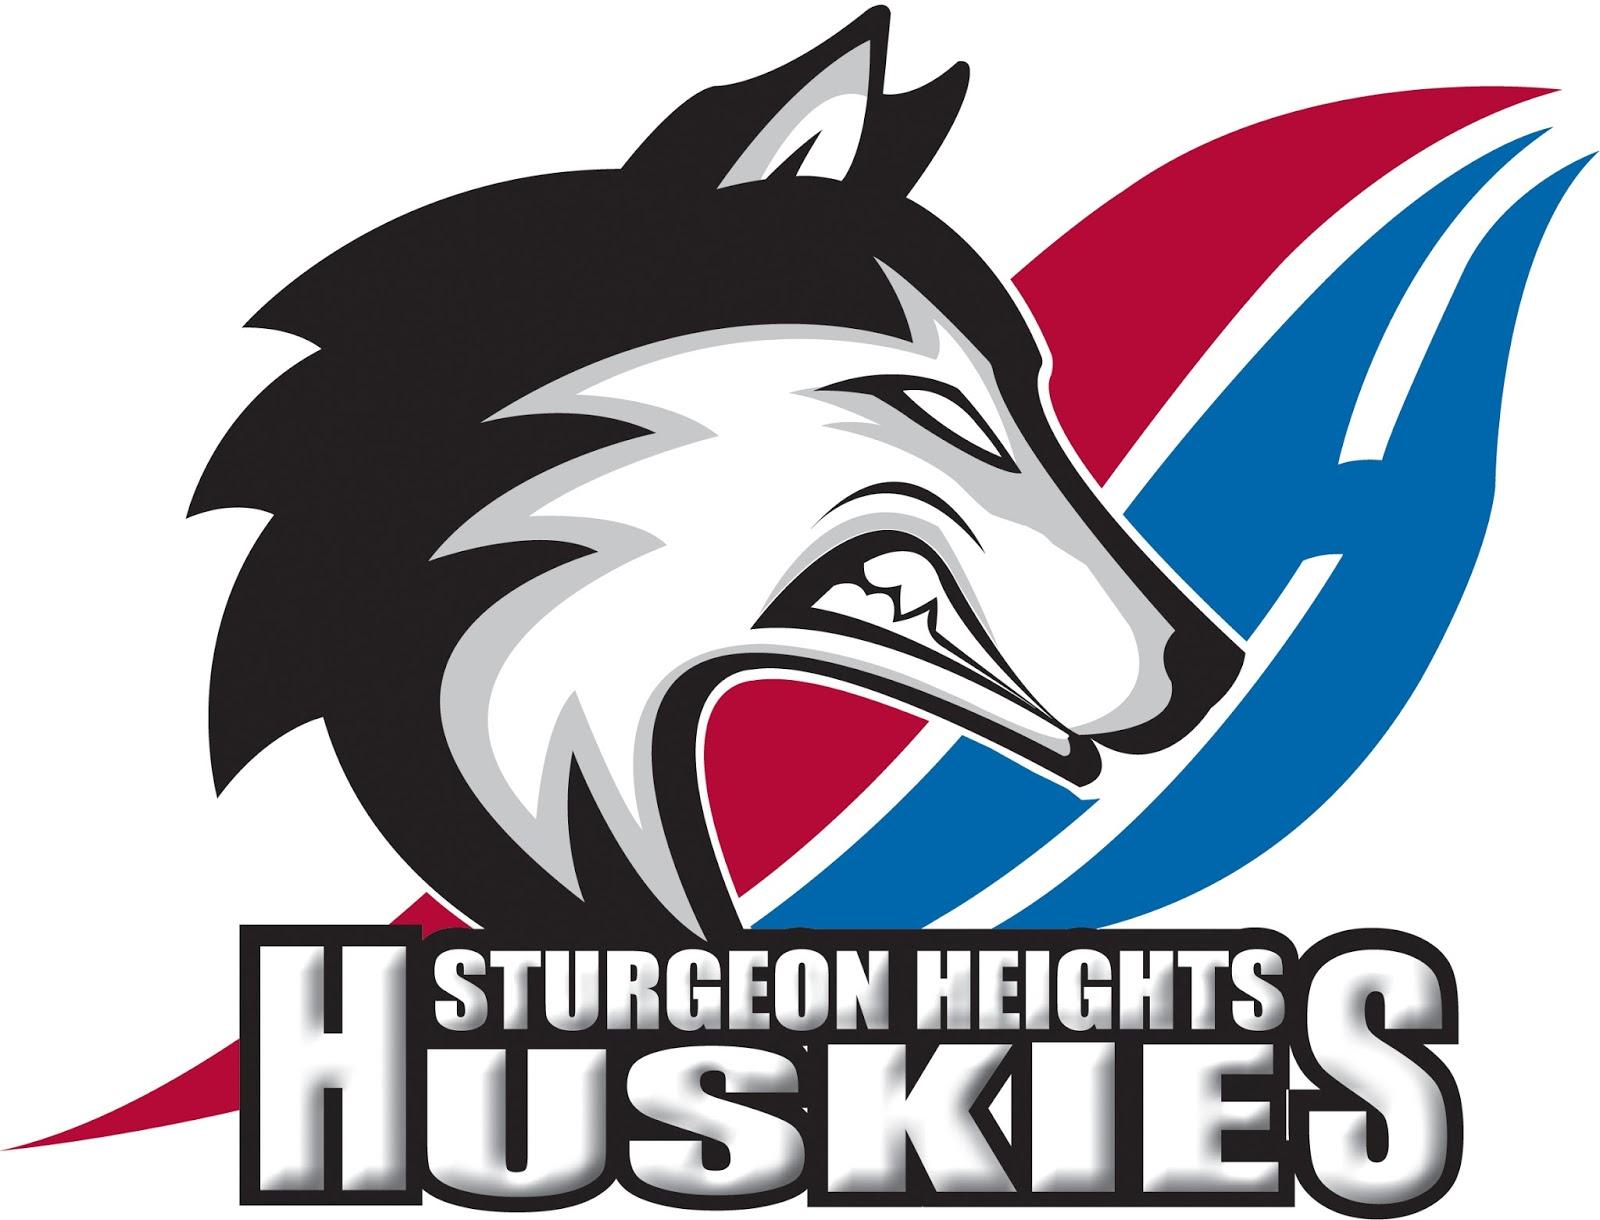 SCHEDULE RELEASED: 2014 Manitoba High School Alumni Game Set for Nov 14-16 - Basketball Manitoba